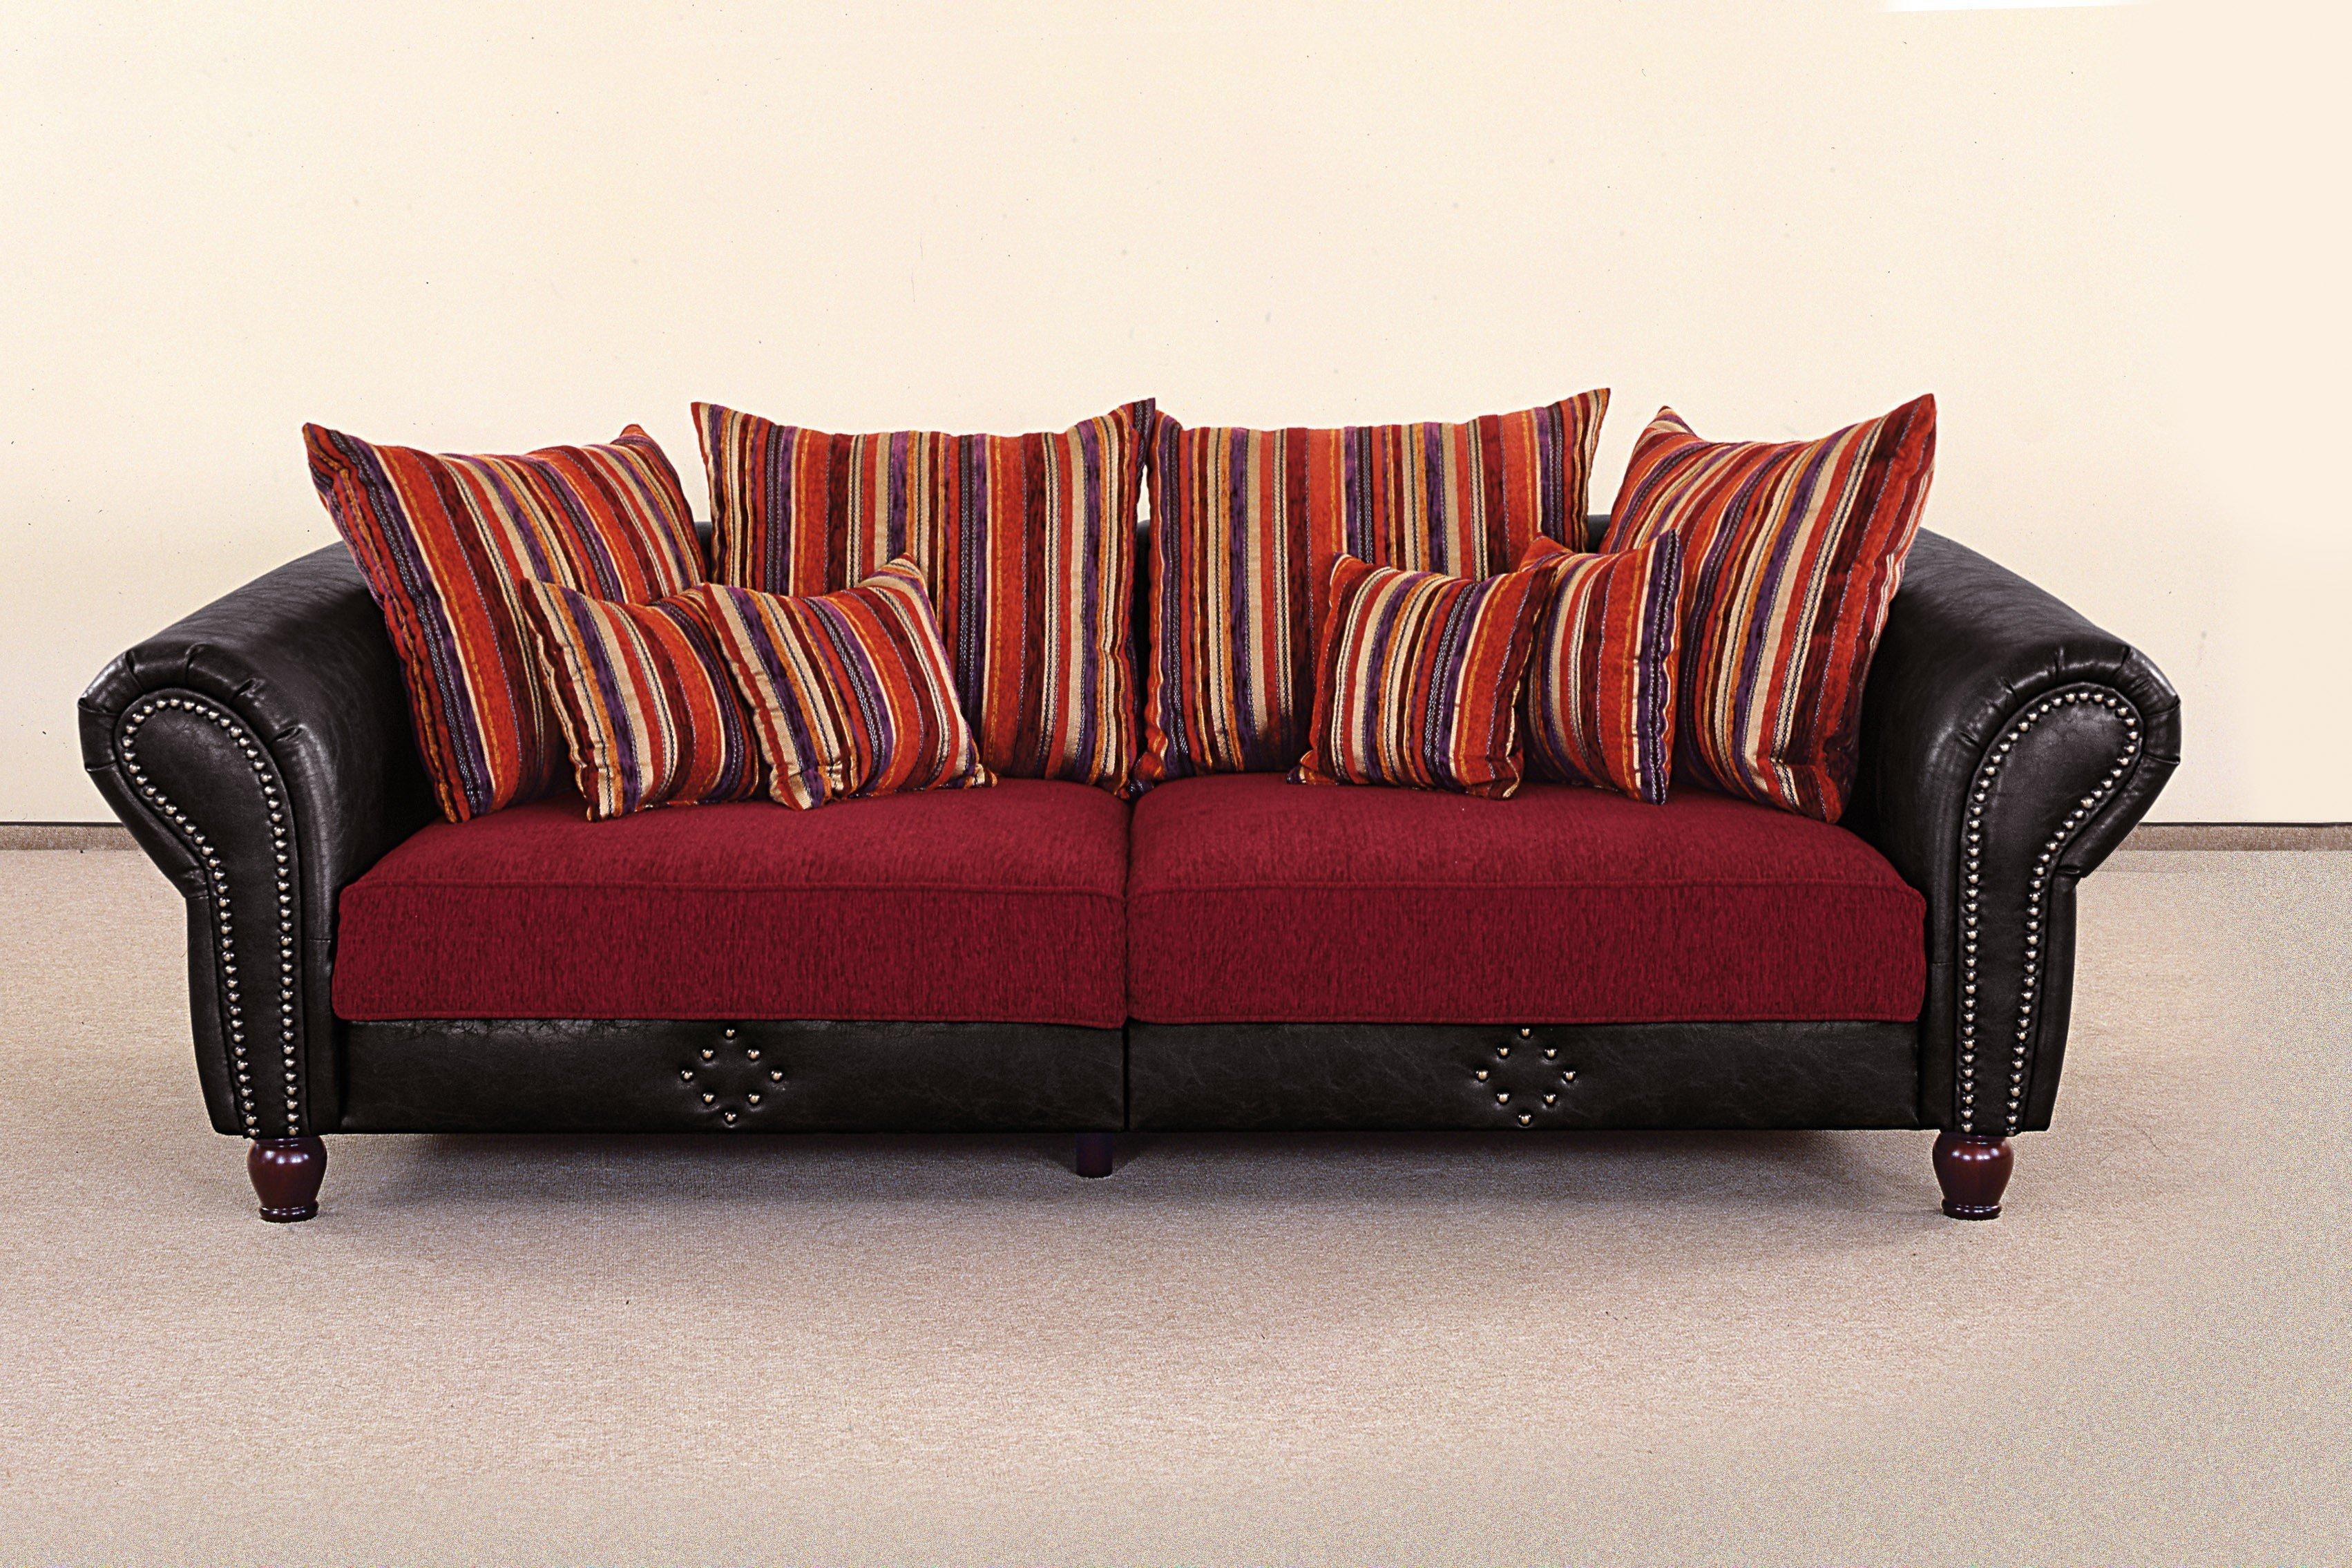 grant factory carlos xxl sofa rot anthrazit m bel letz ihr online shop. Black Bedroom Furniture Sets. Home Design Ideas